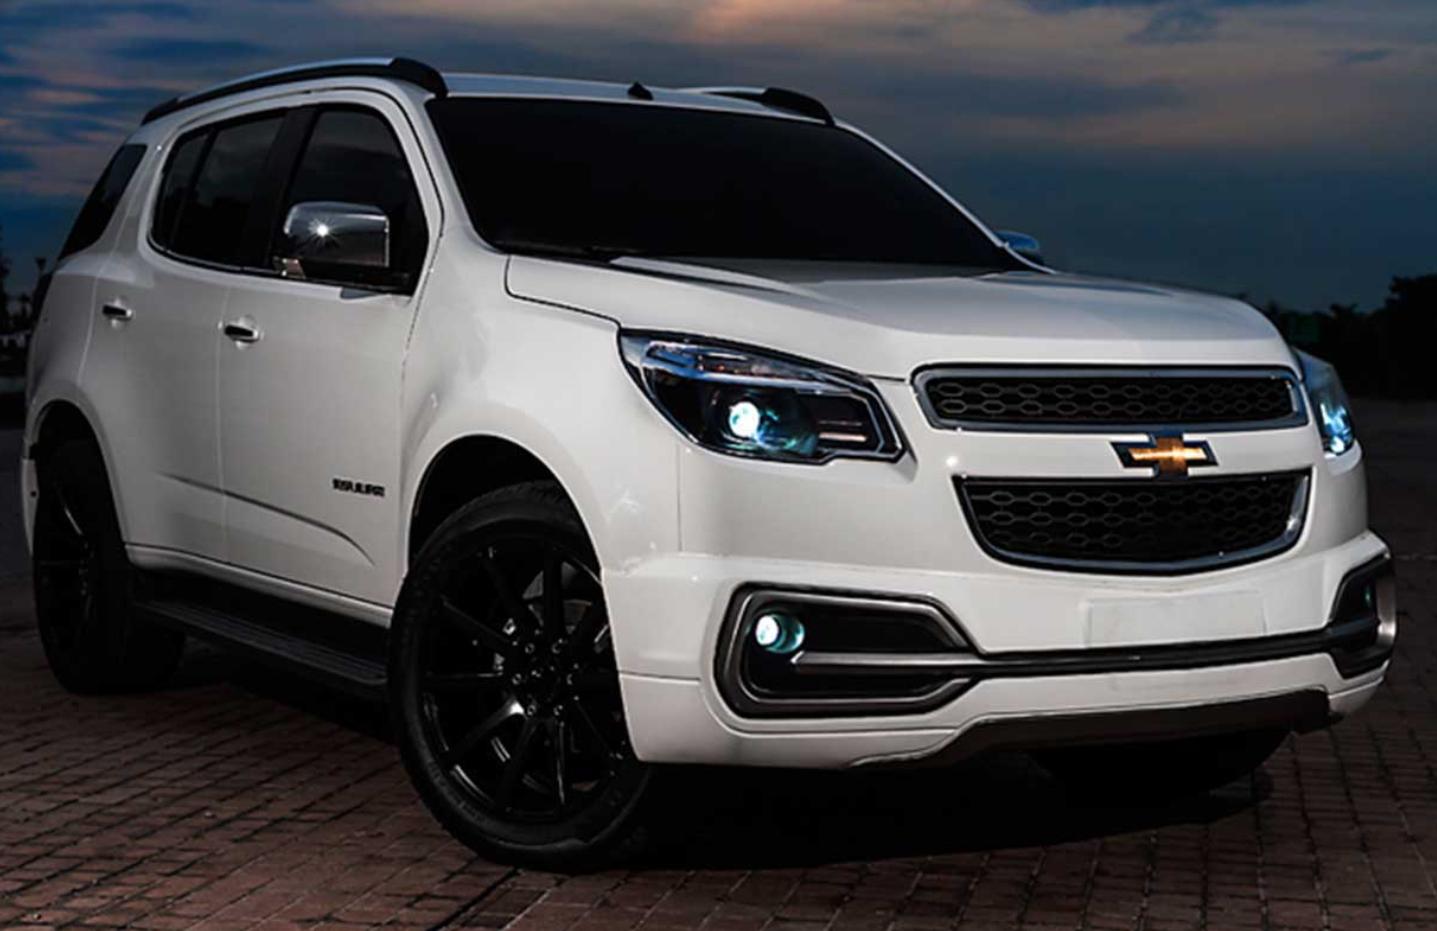 2018 Chevrolet Trailblazer Usa Concept Performance